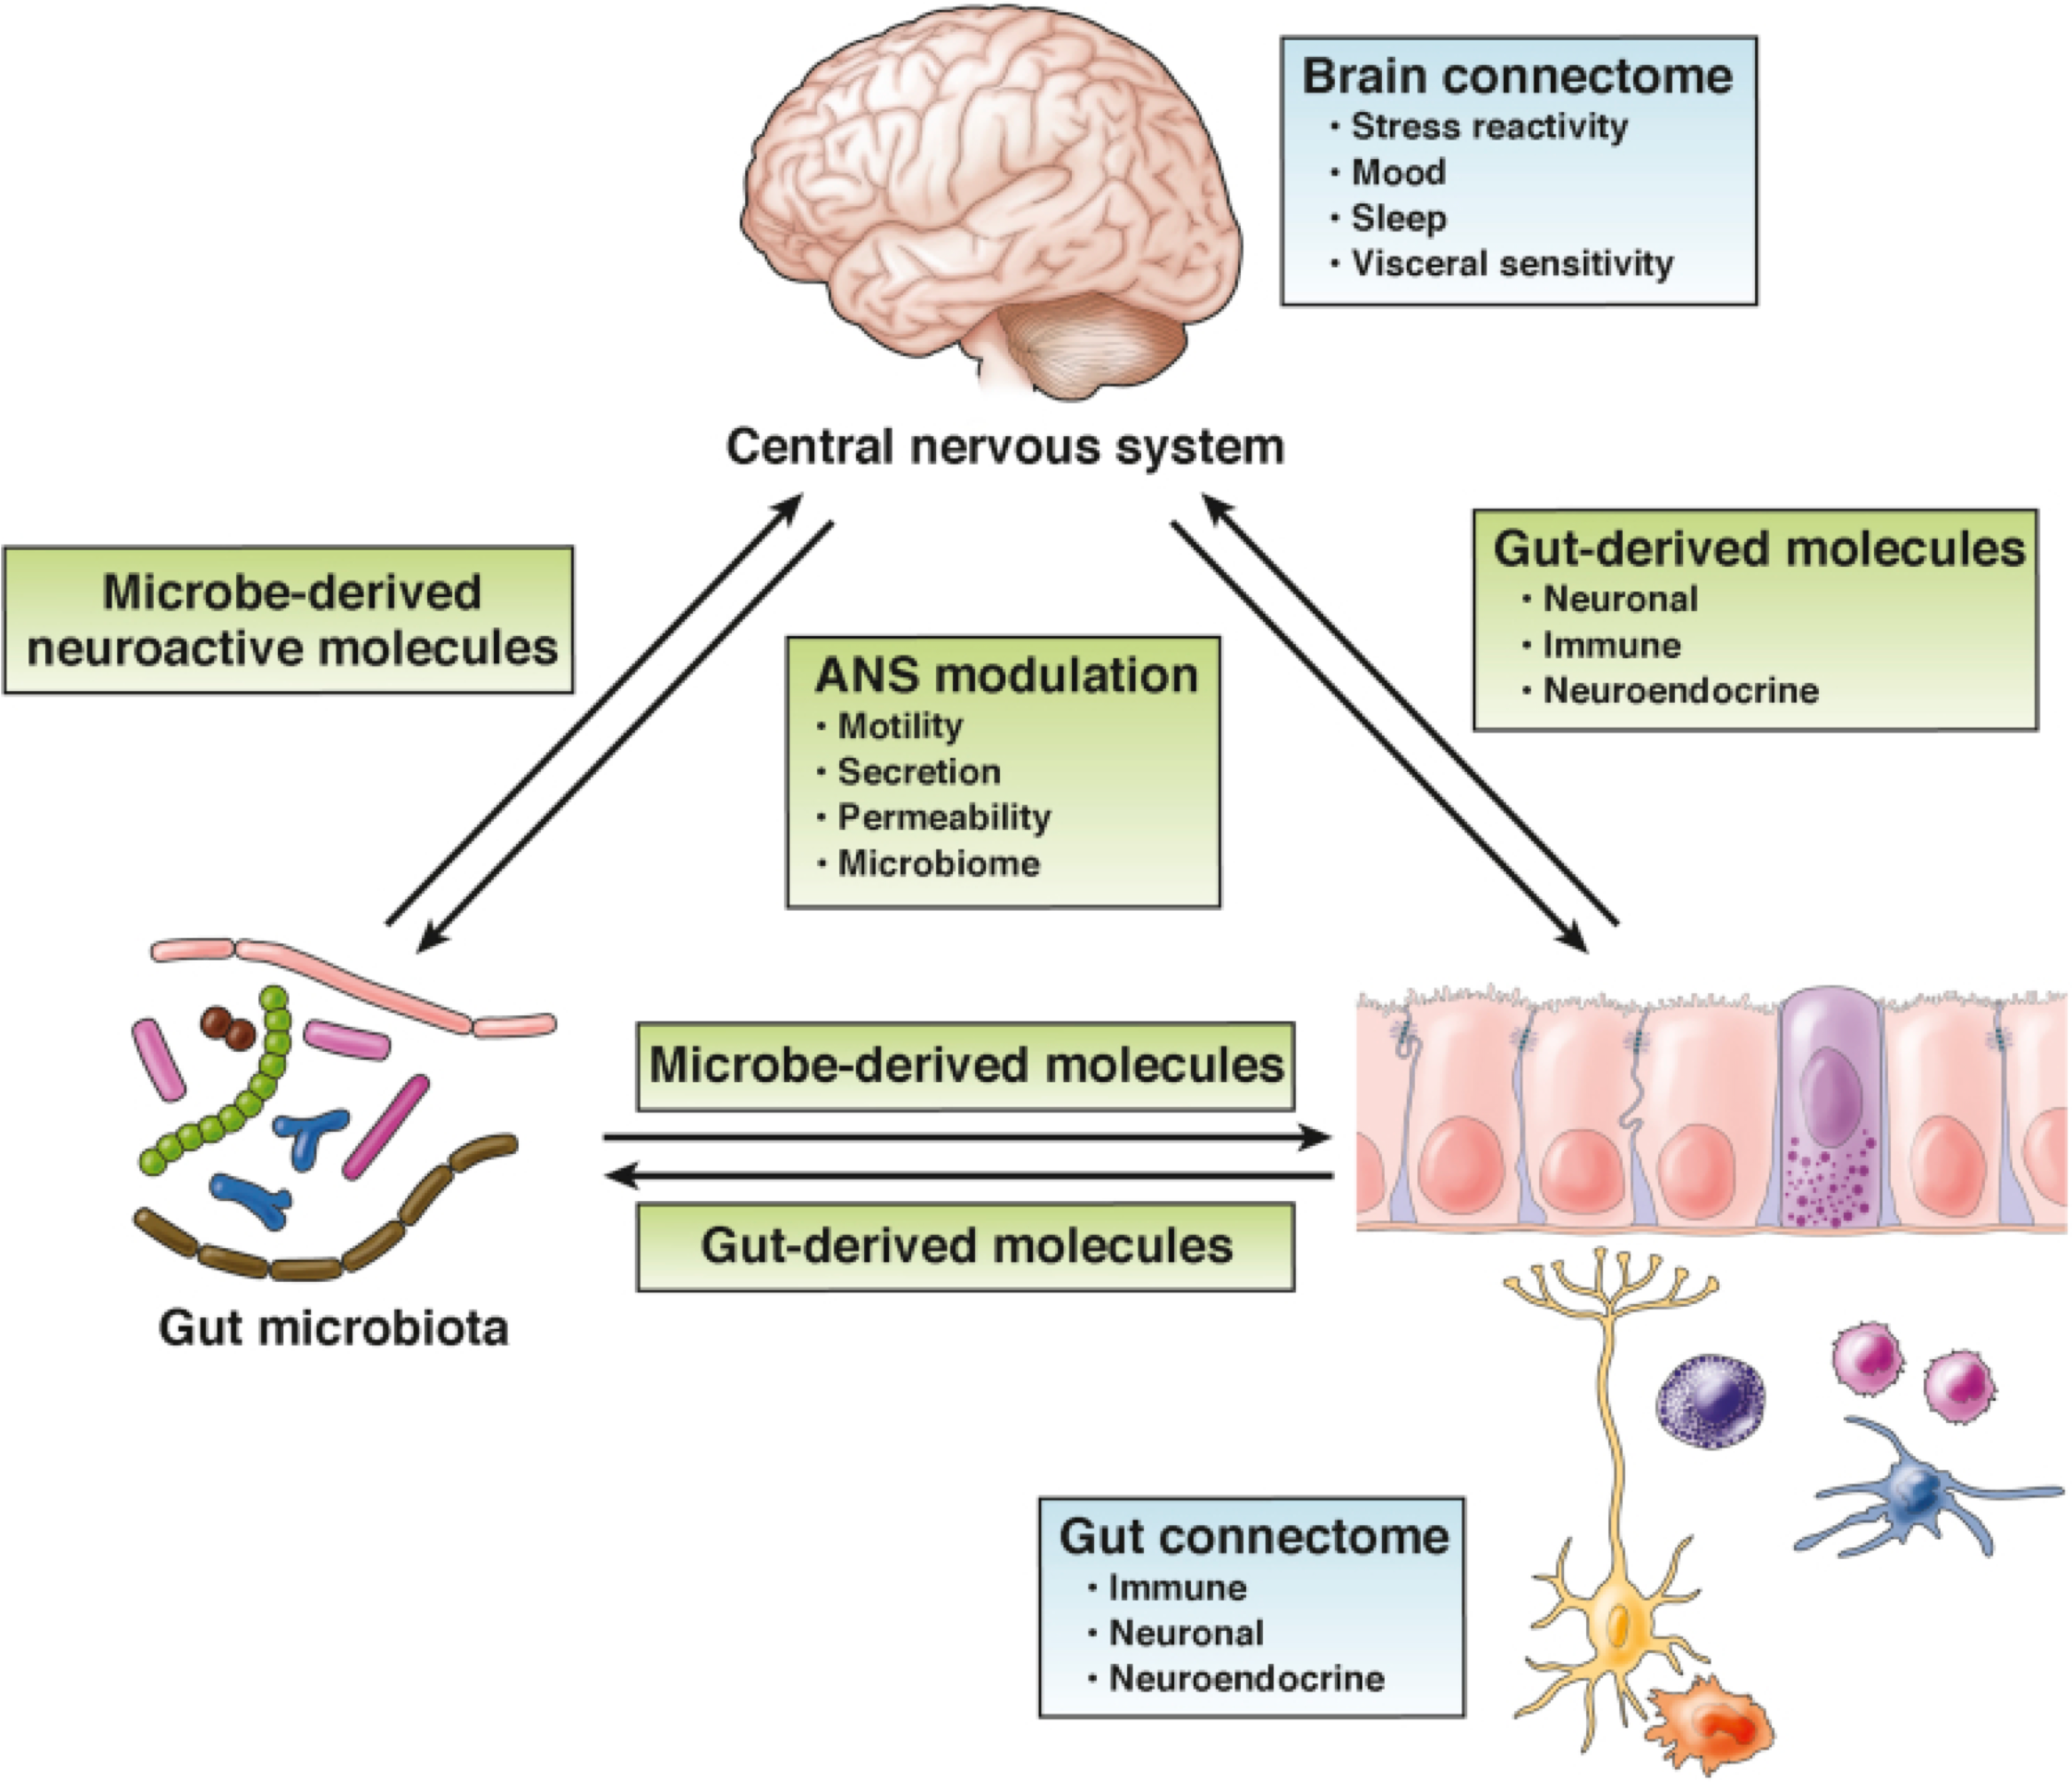 Martin CR, Osadchiy V, Kalani A, Mayer EA. The Brain-Gut-Microbiome Axis. Cell Mol Gastroenterol Hepatol. 2018;6(2):133-148.